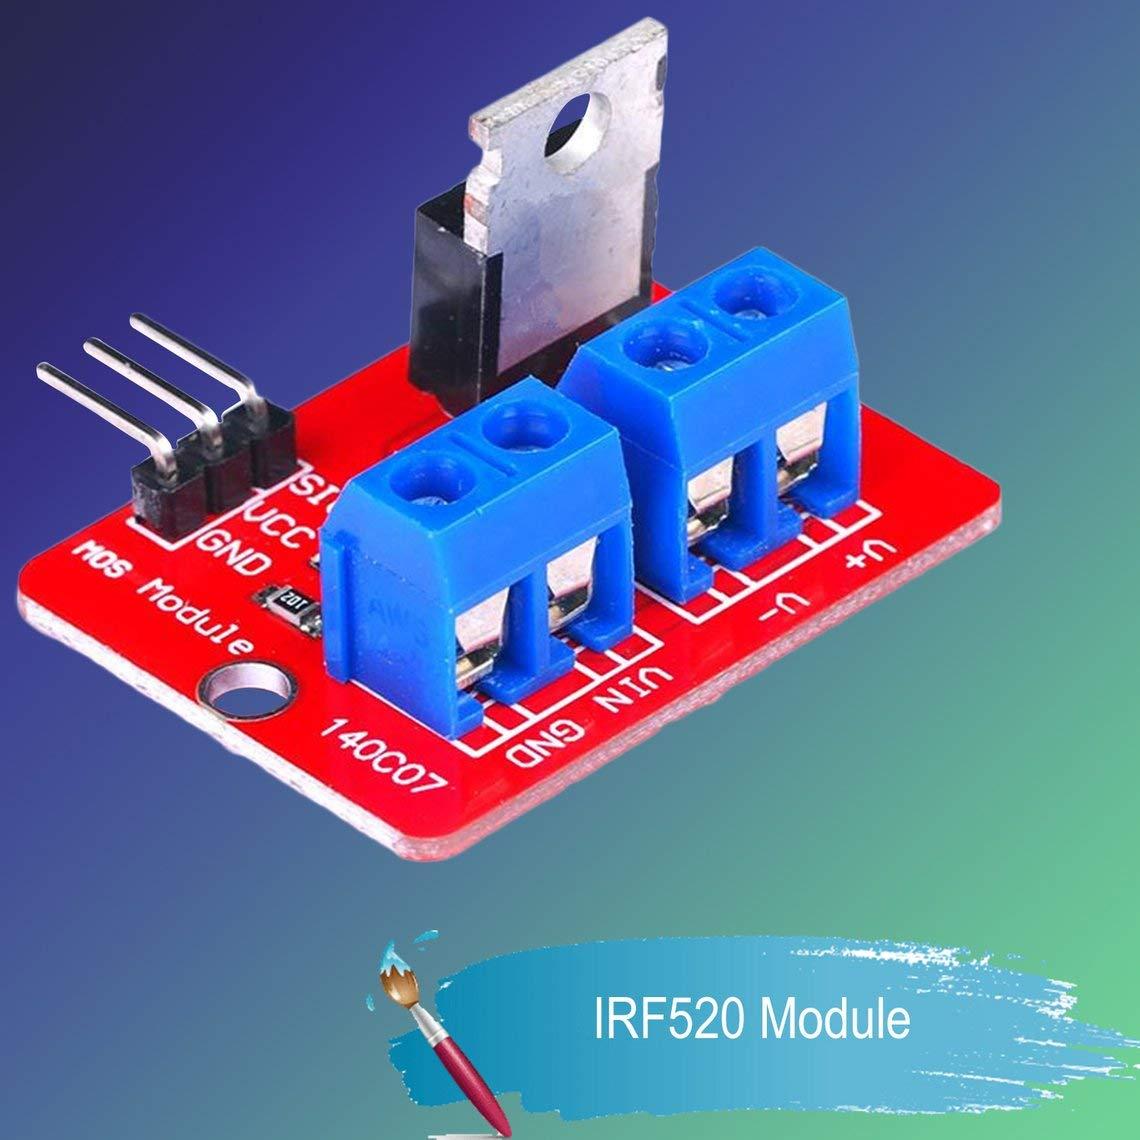 Momorain 0-24V Top Mosfet Button IRF520 Mos Driver Module Board para Arduino MCU Arm Raspberry Pi Electronic DIY Tool Dimming LED